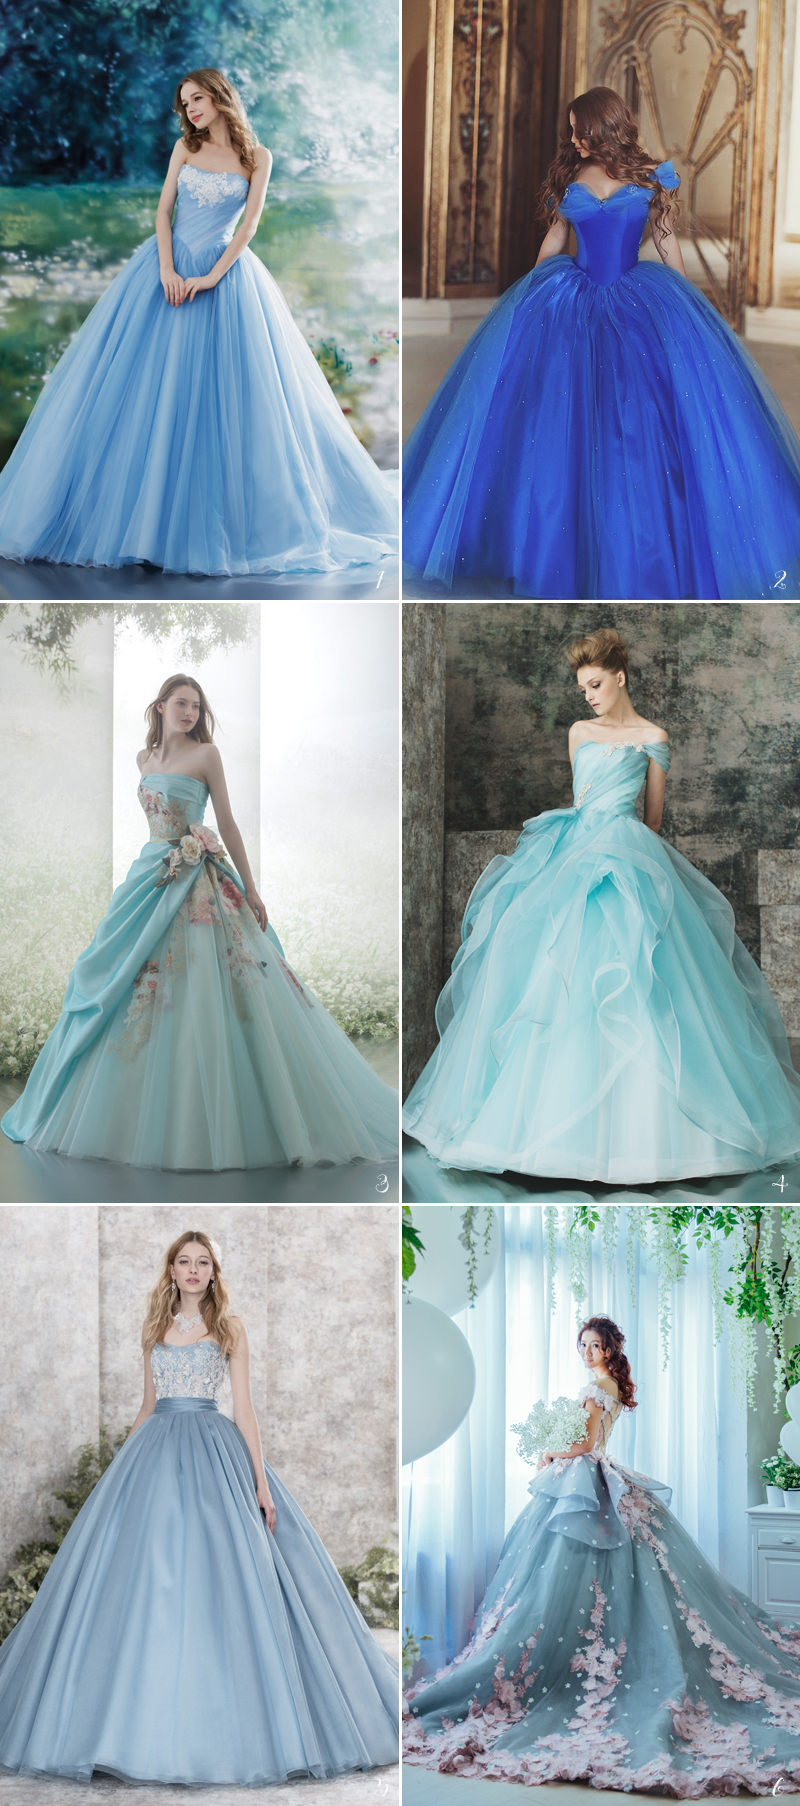 cinderella wedding dresses theme